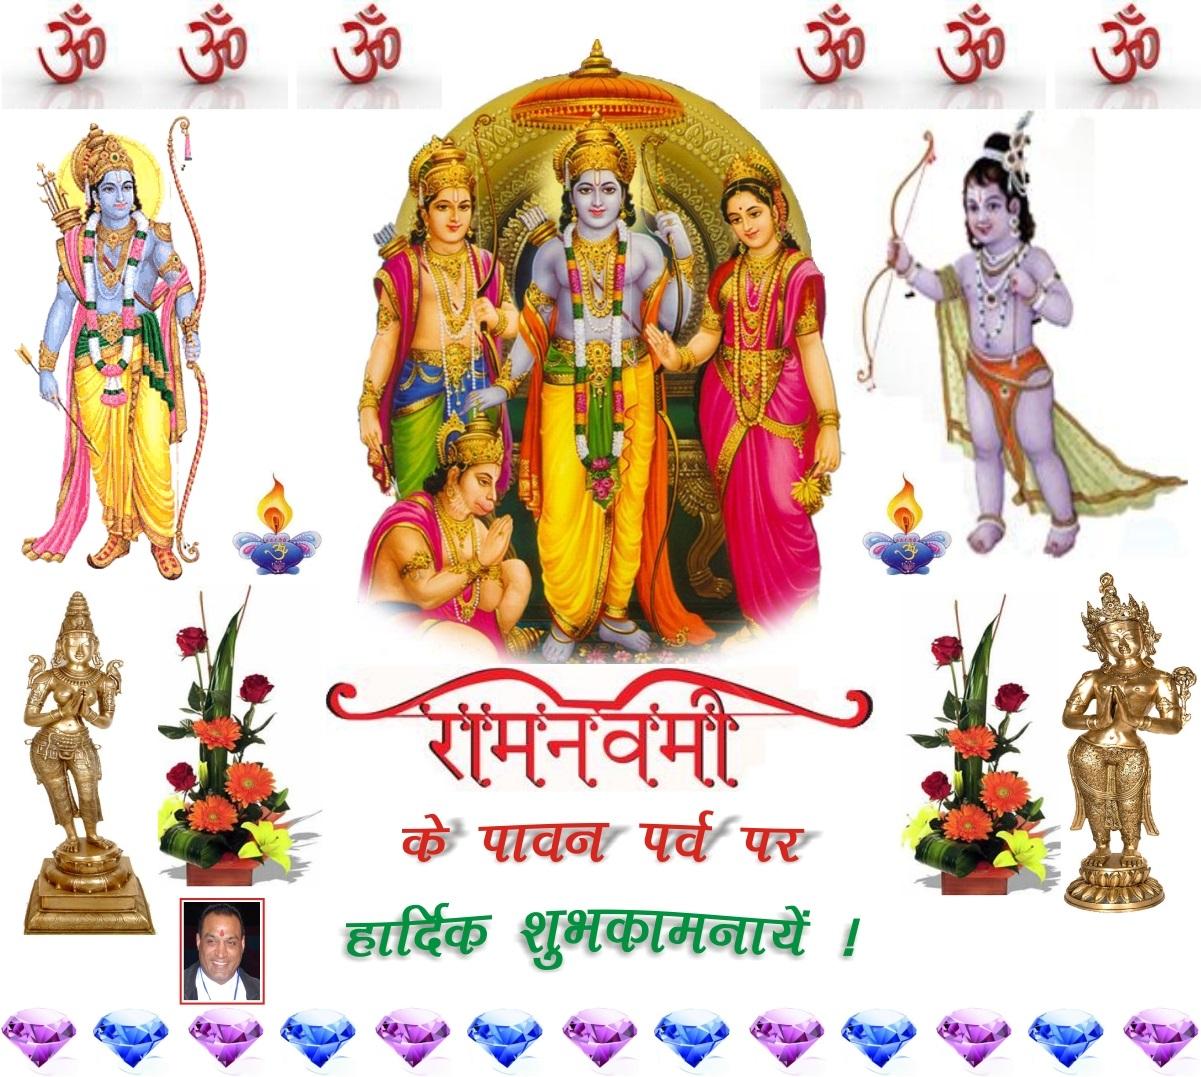 26 Wonderful Ram Navami Wishes Pictures